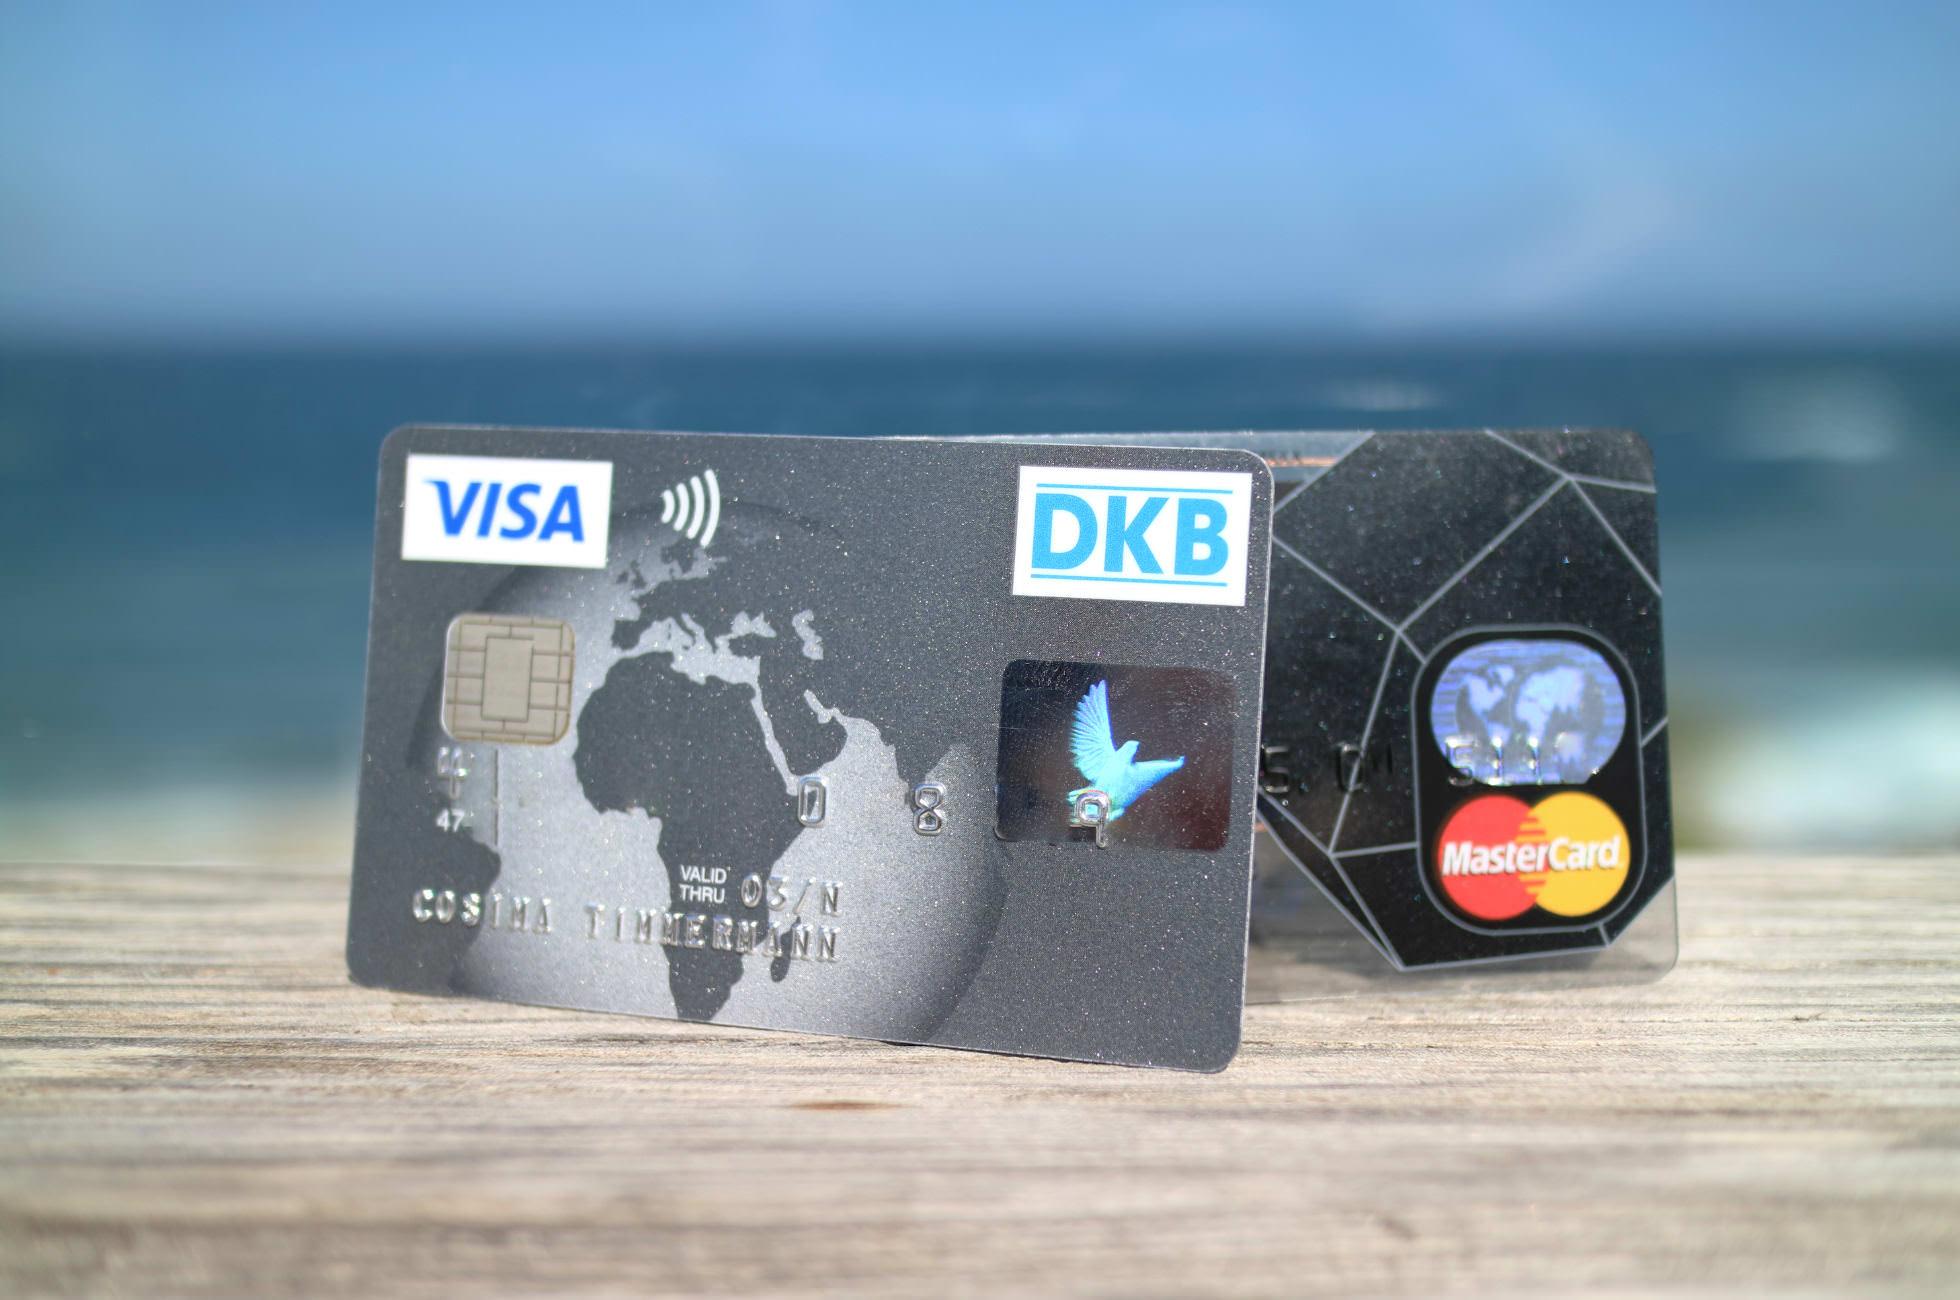 Reisekreditkarten